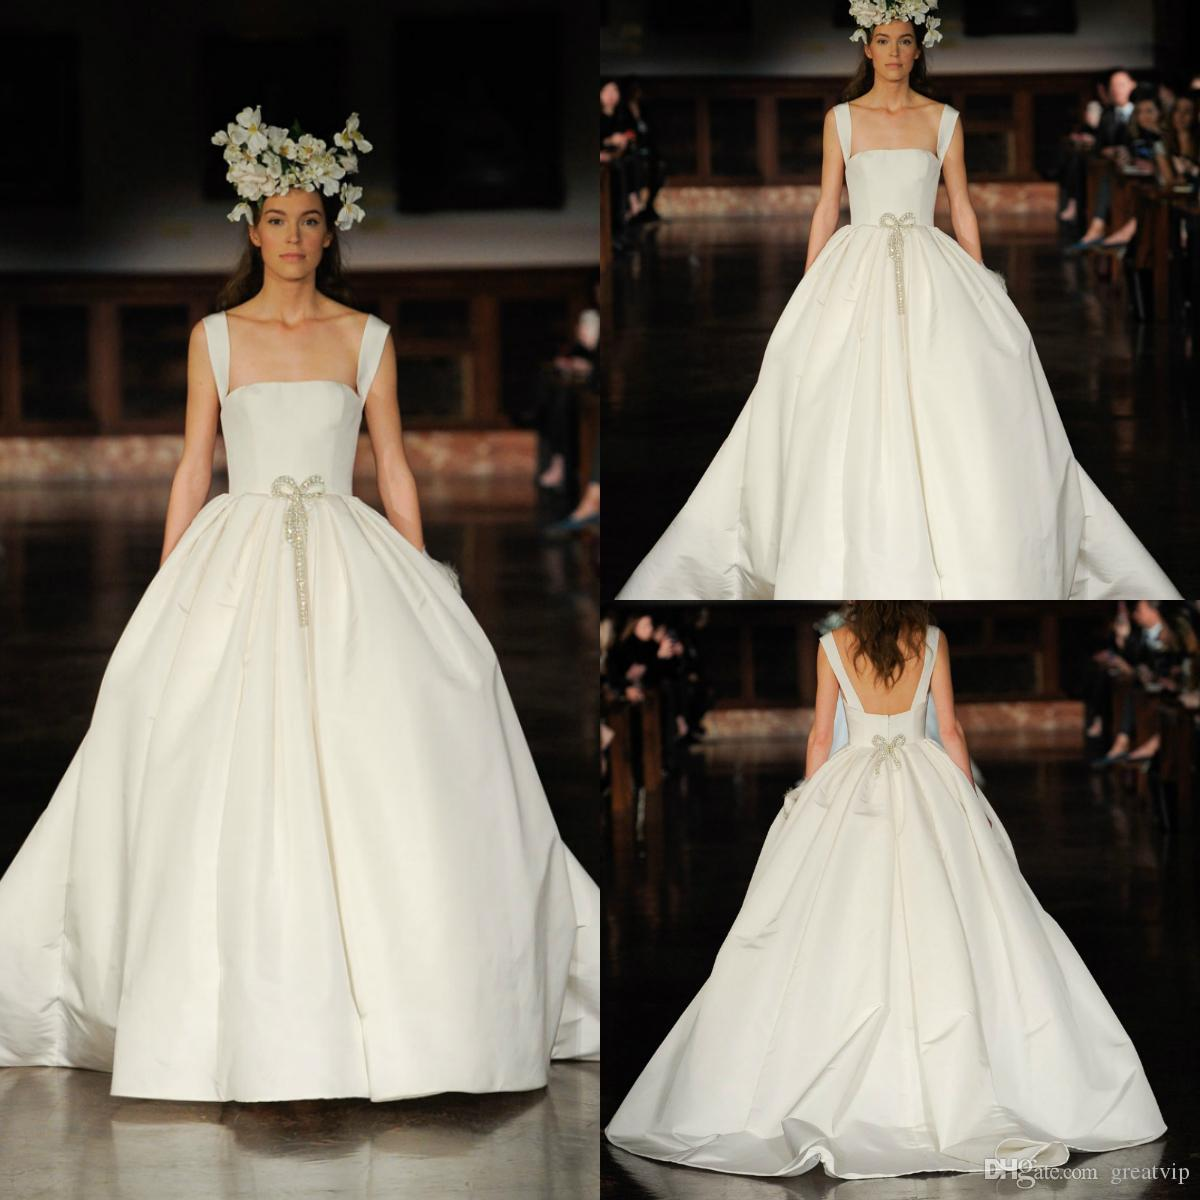 6352eefcf8 Discount Reem Acra 2019 Wedding Dresses Spaghetti Crystals Satin Plus Size  Princess Bridal Gowns Caften Beach Bohemia Robe De Mariée Wedding Dresses  Under ...